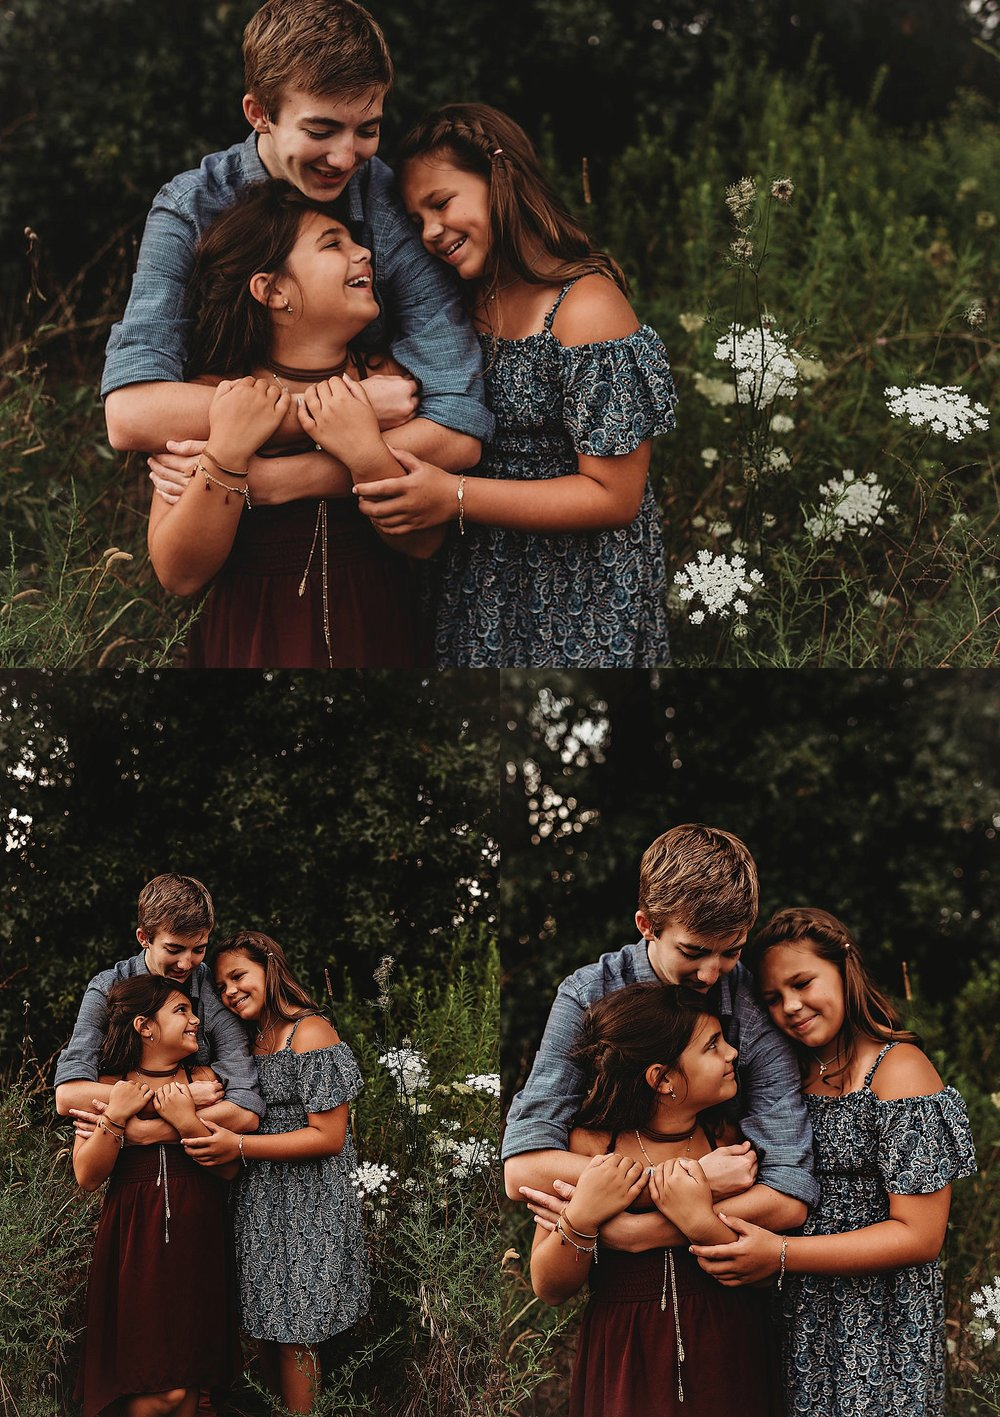 mcfredrick-family-lauren-grayson-akron-ohio_0013.jpg